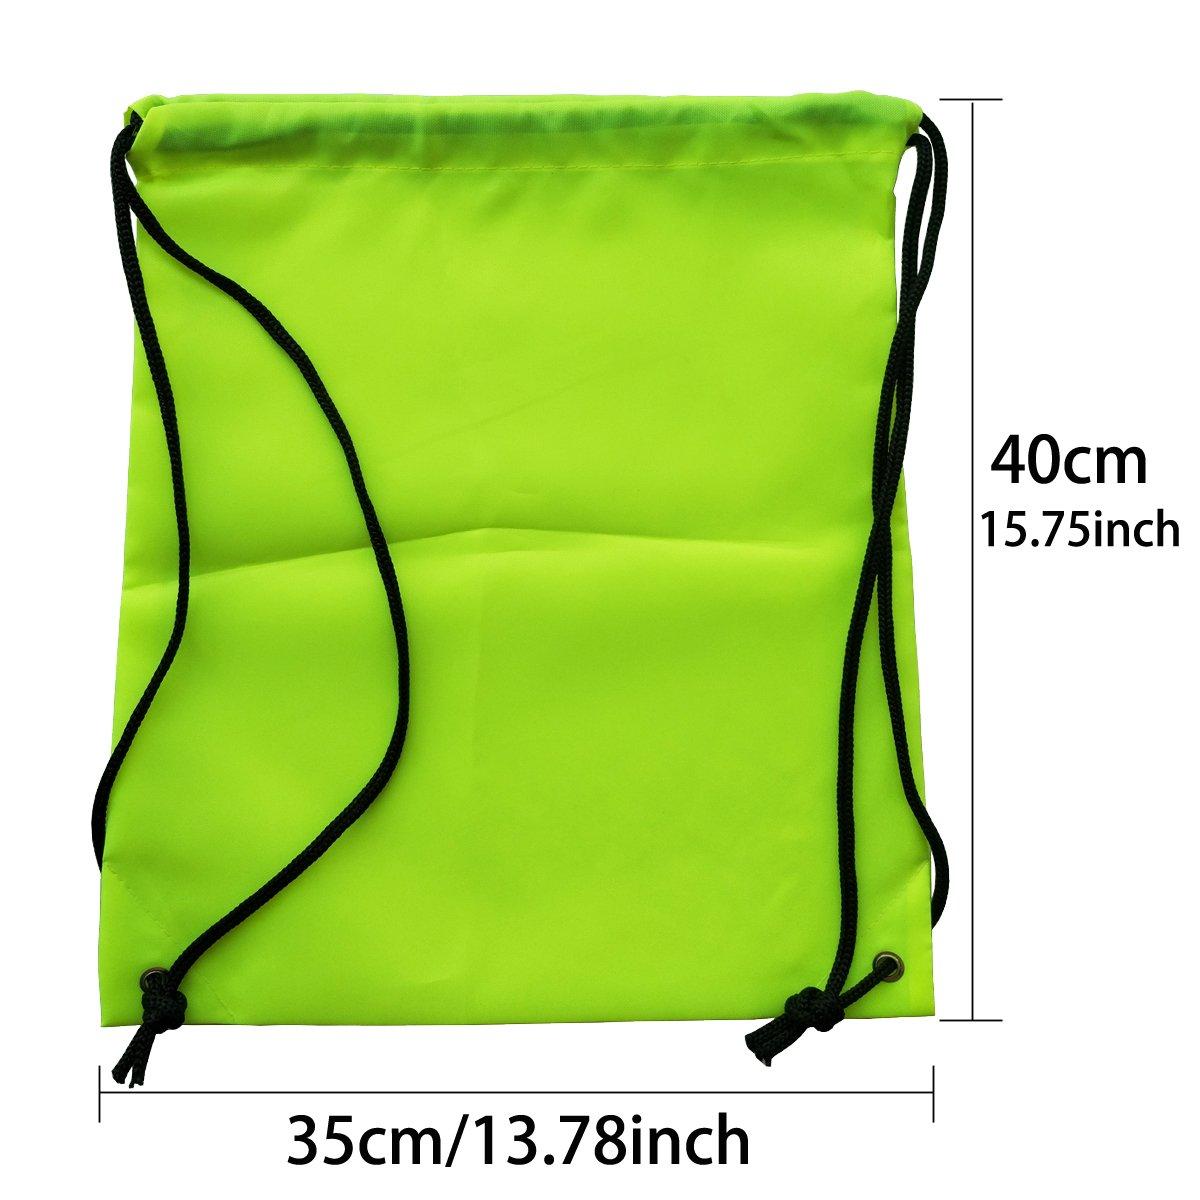 6 Pack Drawstring Backpack Bags 420D polyester fabric Folding Shoulder Cinch Bag by Topspeeder (Image #2)